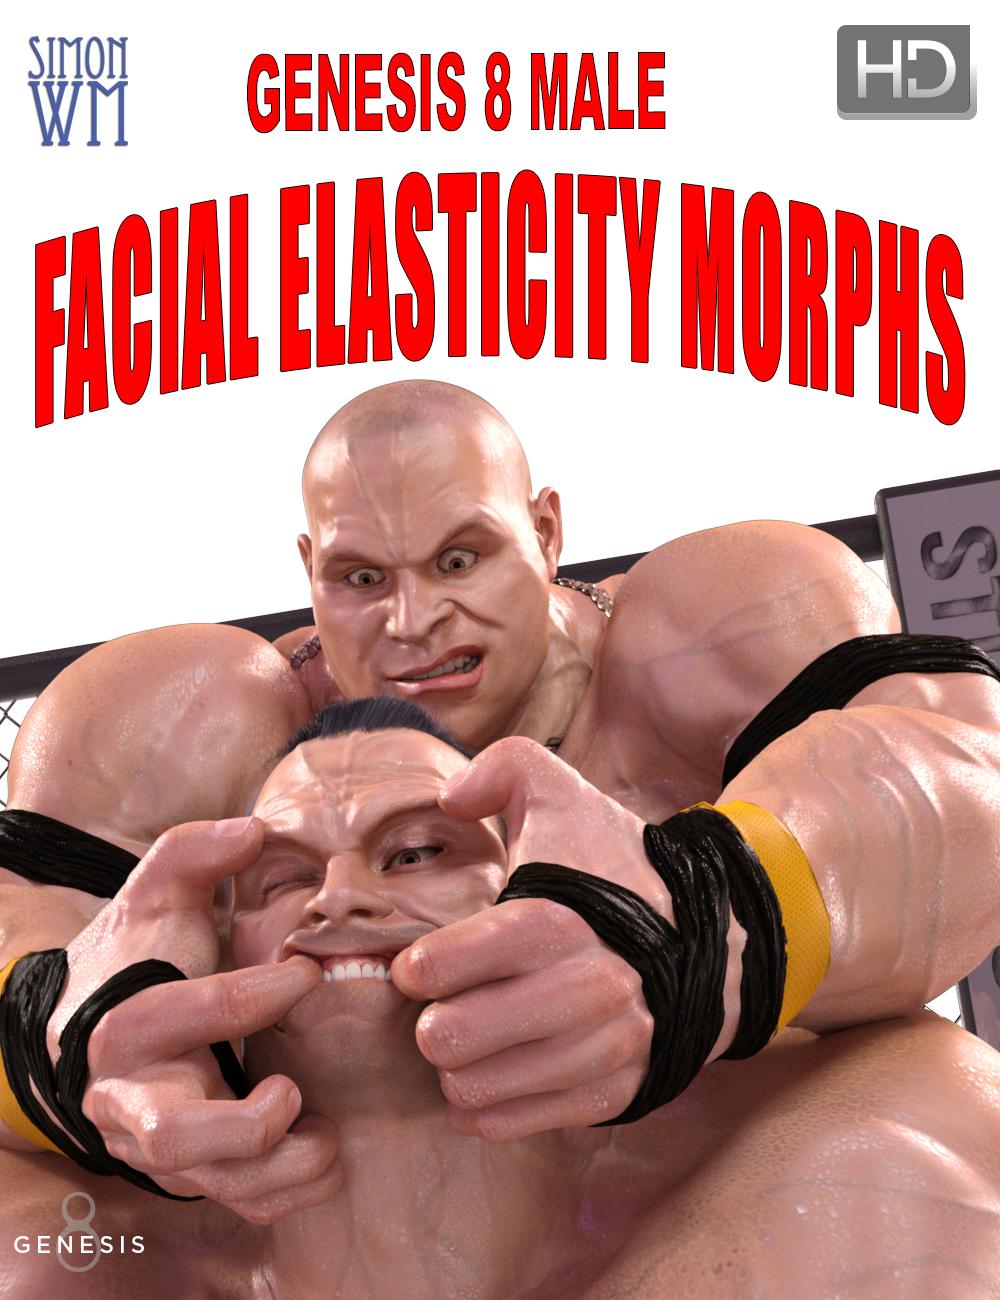 Genesis 8 Male Facial Elasticity Morphs by: SimonWM, 3D Models by Daz 3D